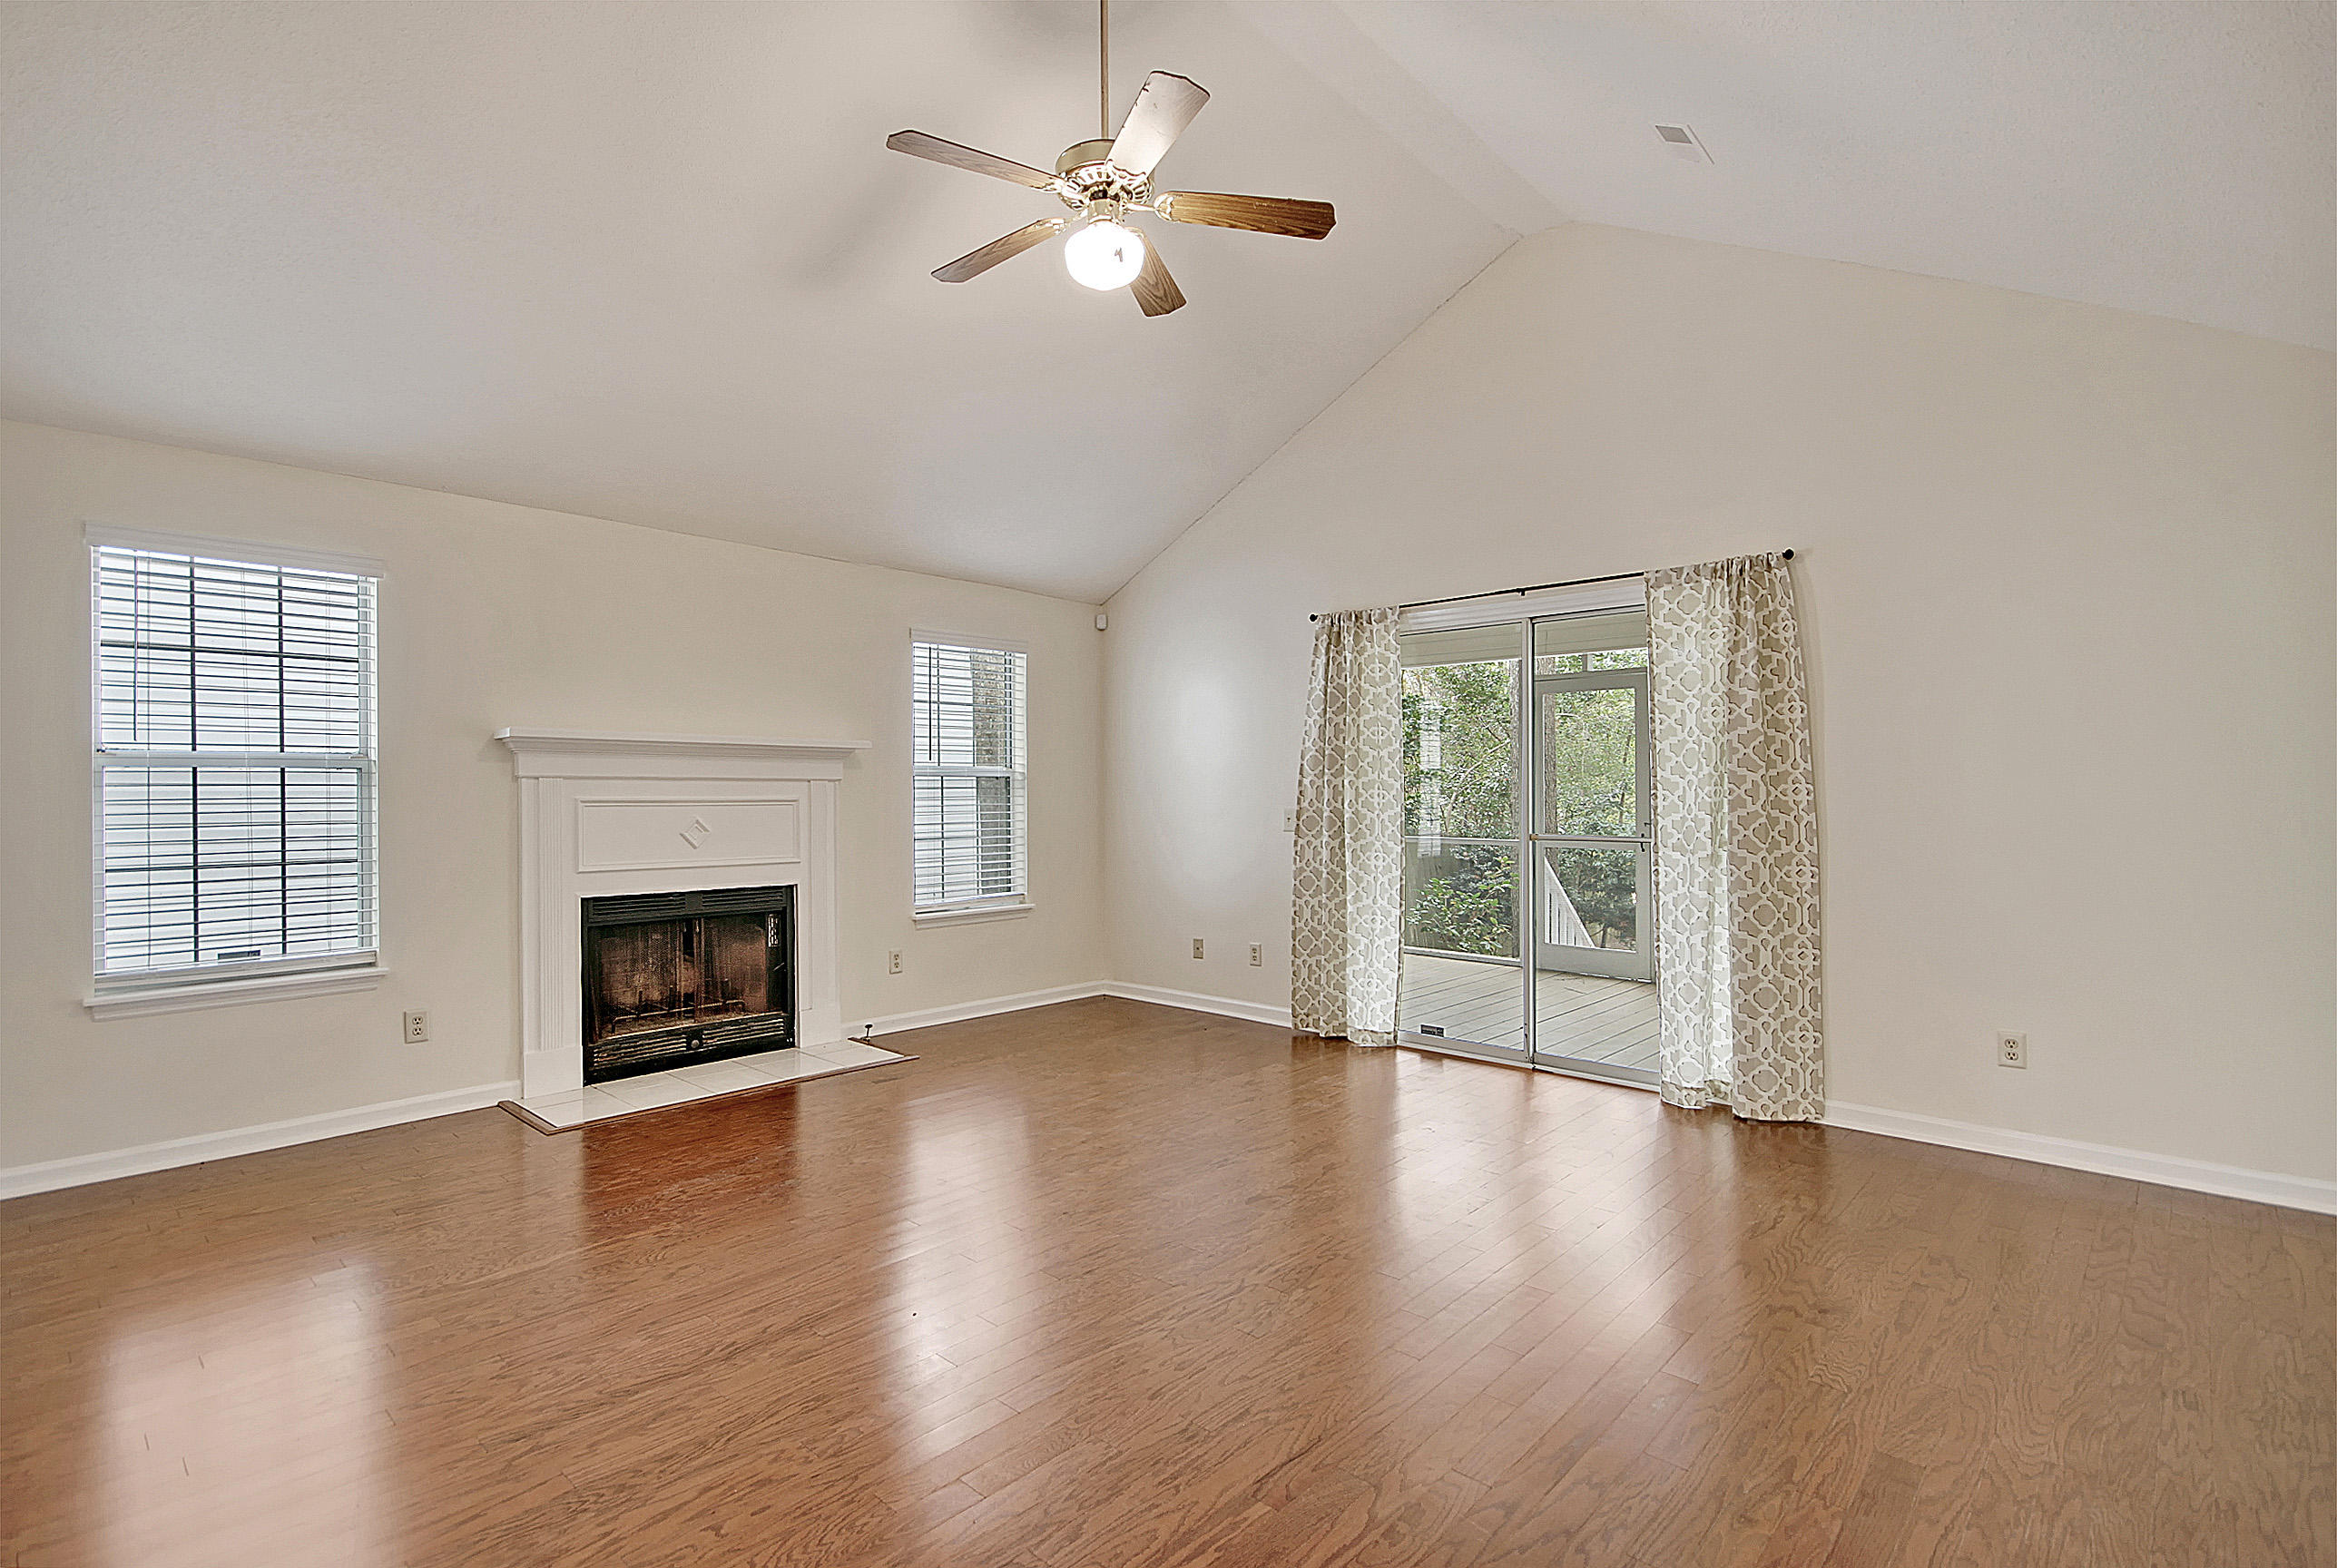 Harbor Place Homes For Sale - 845 Harbor Pl, Charleston, SC - 3